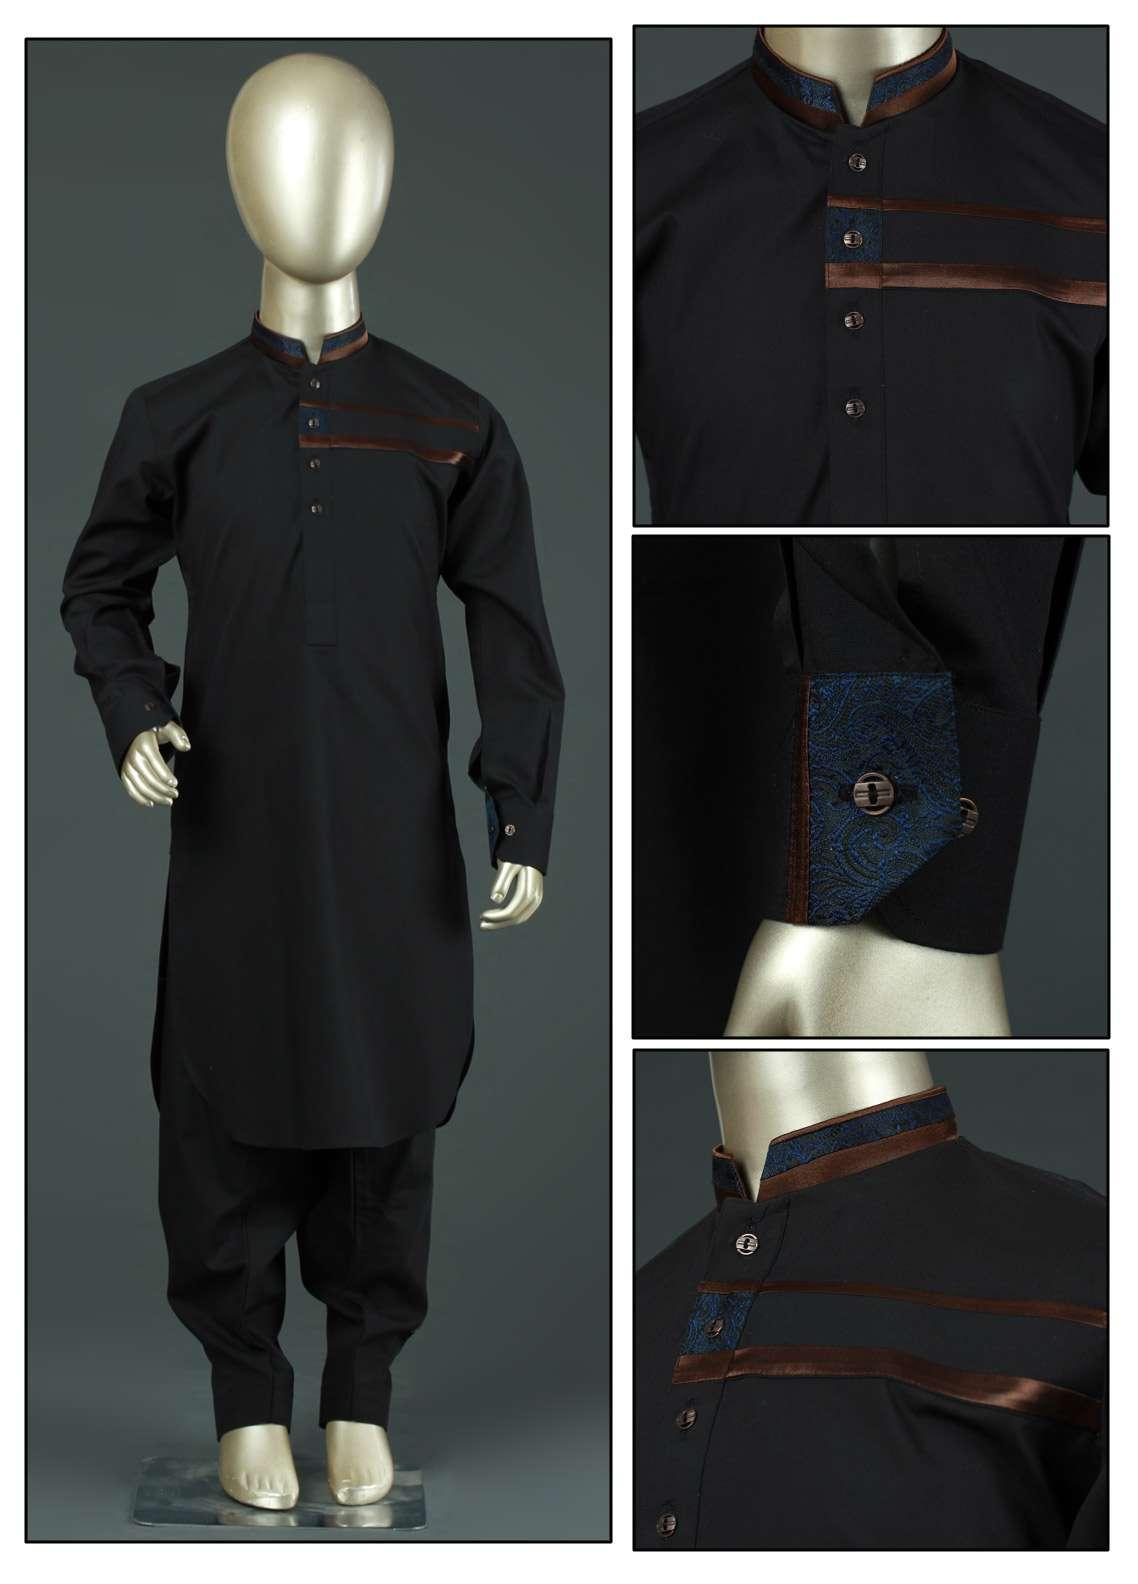 Aizaz Zafar Cotton Formal Kameez Shalwar for Boys - AZ19B 214 Black